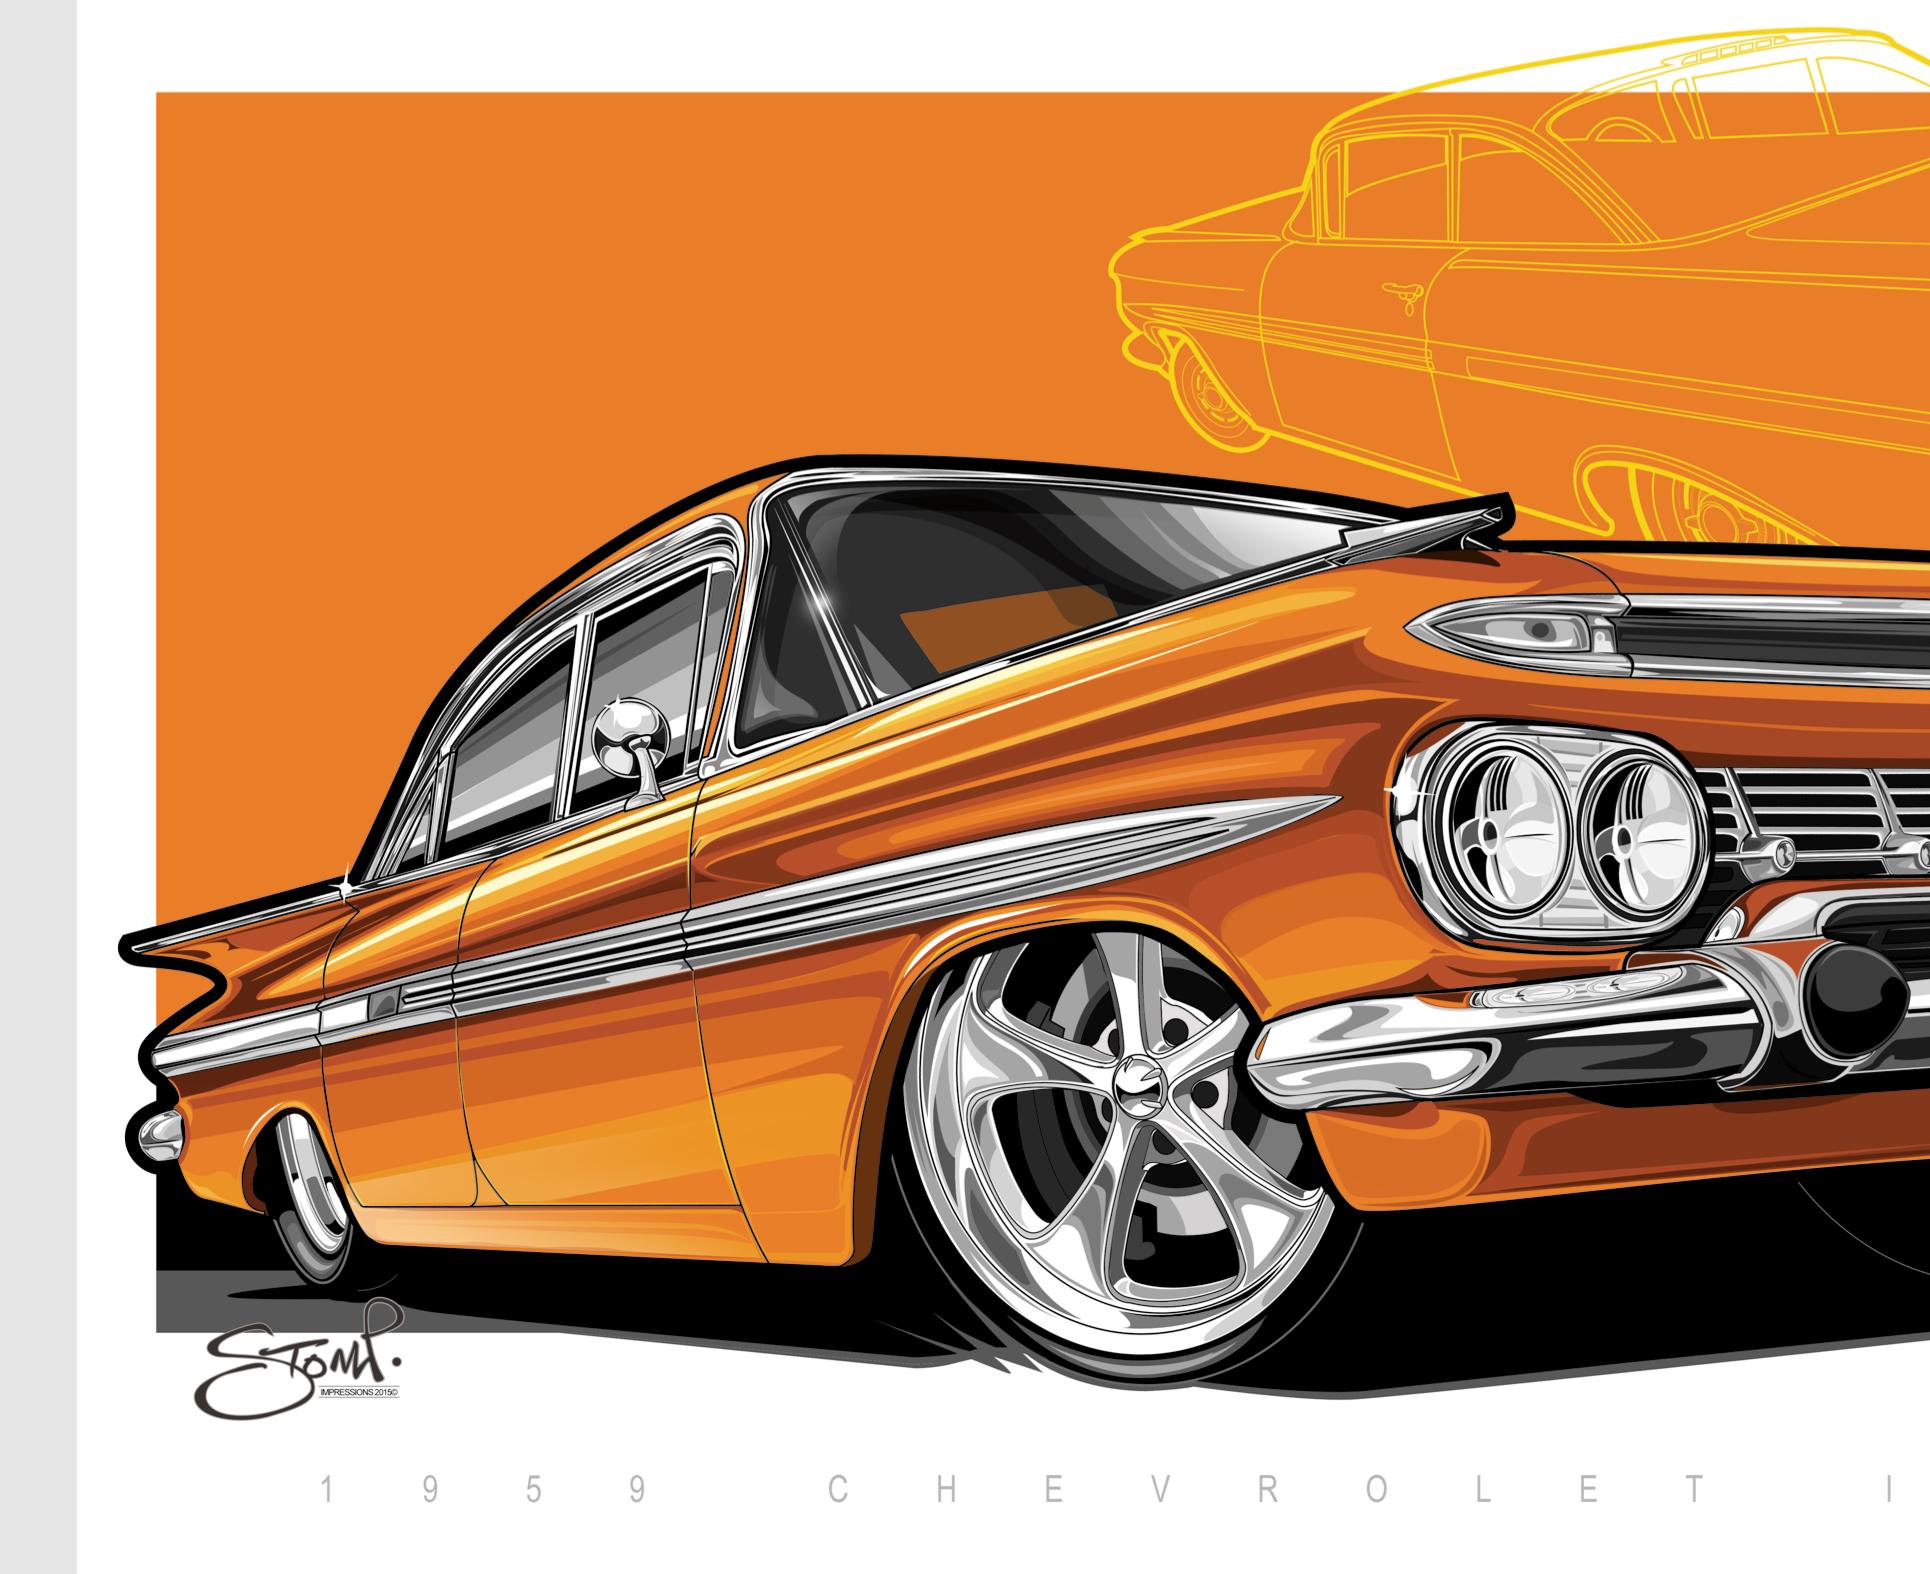 Chevrolet Impala 1959 Muscle Car Artwork Stomp Impressions 2016